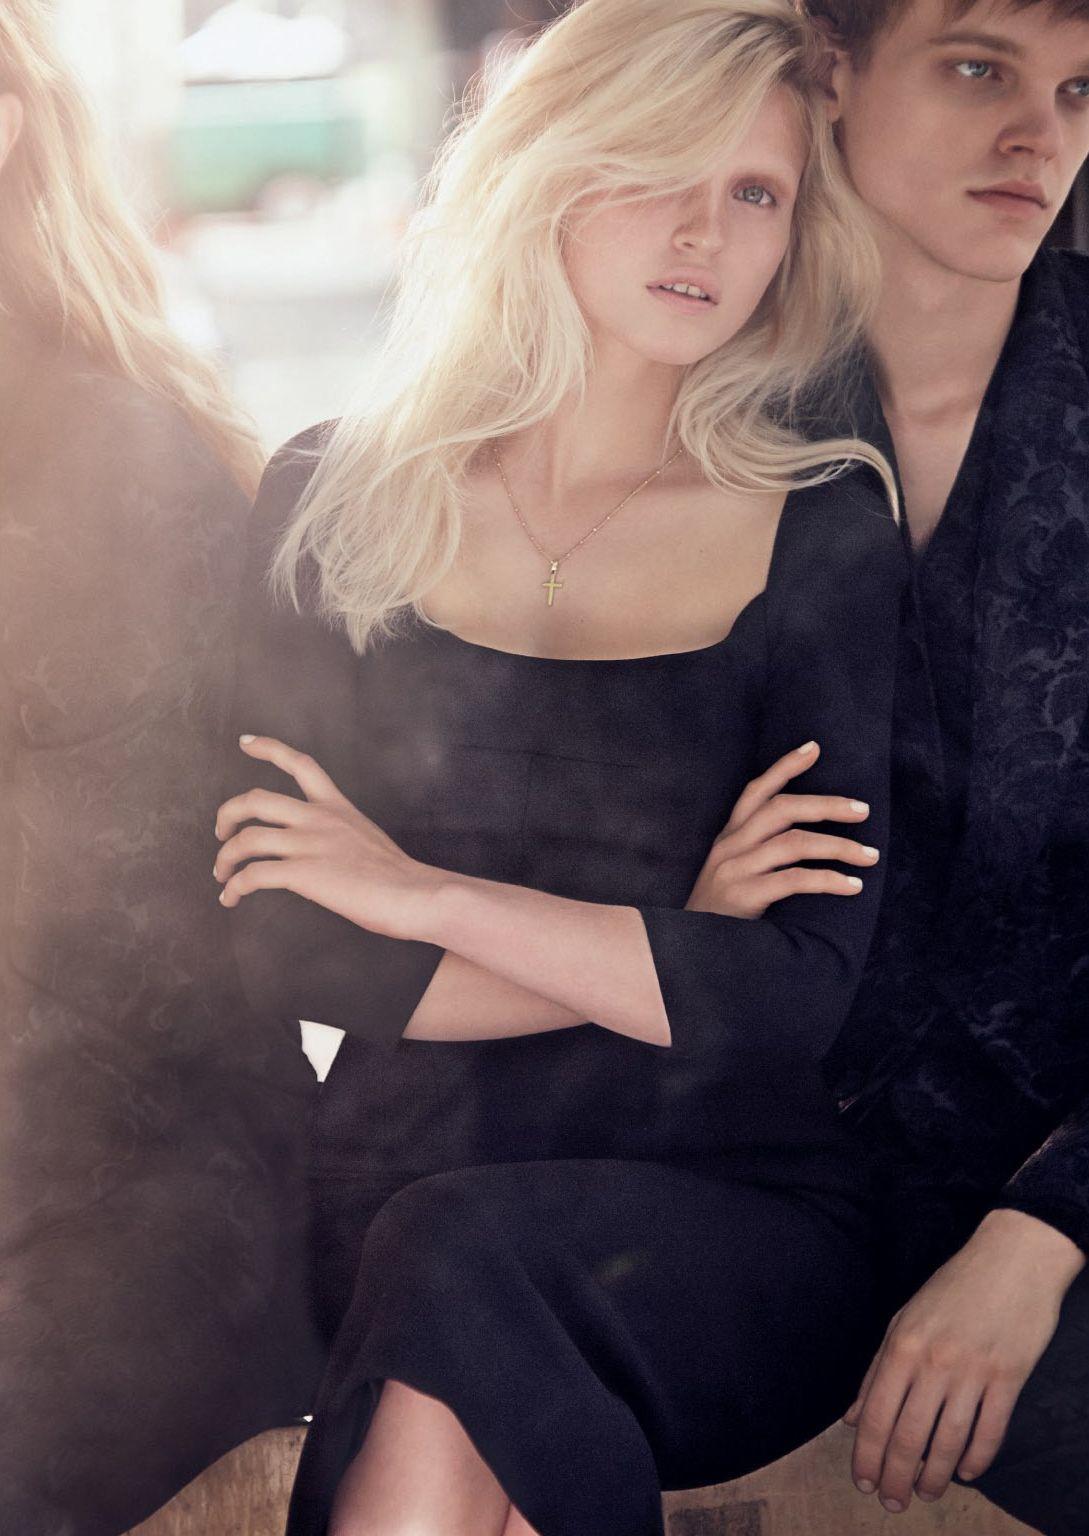 Kids From The Block: Anja Konstantinova, Kori Richardson, Odin Grina, Reid Rohling by Alexi Lubomirski for Vogue Russia August 2015 - Dolce&Gabbana Fall 2015